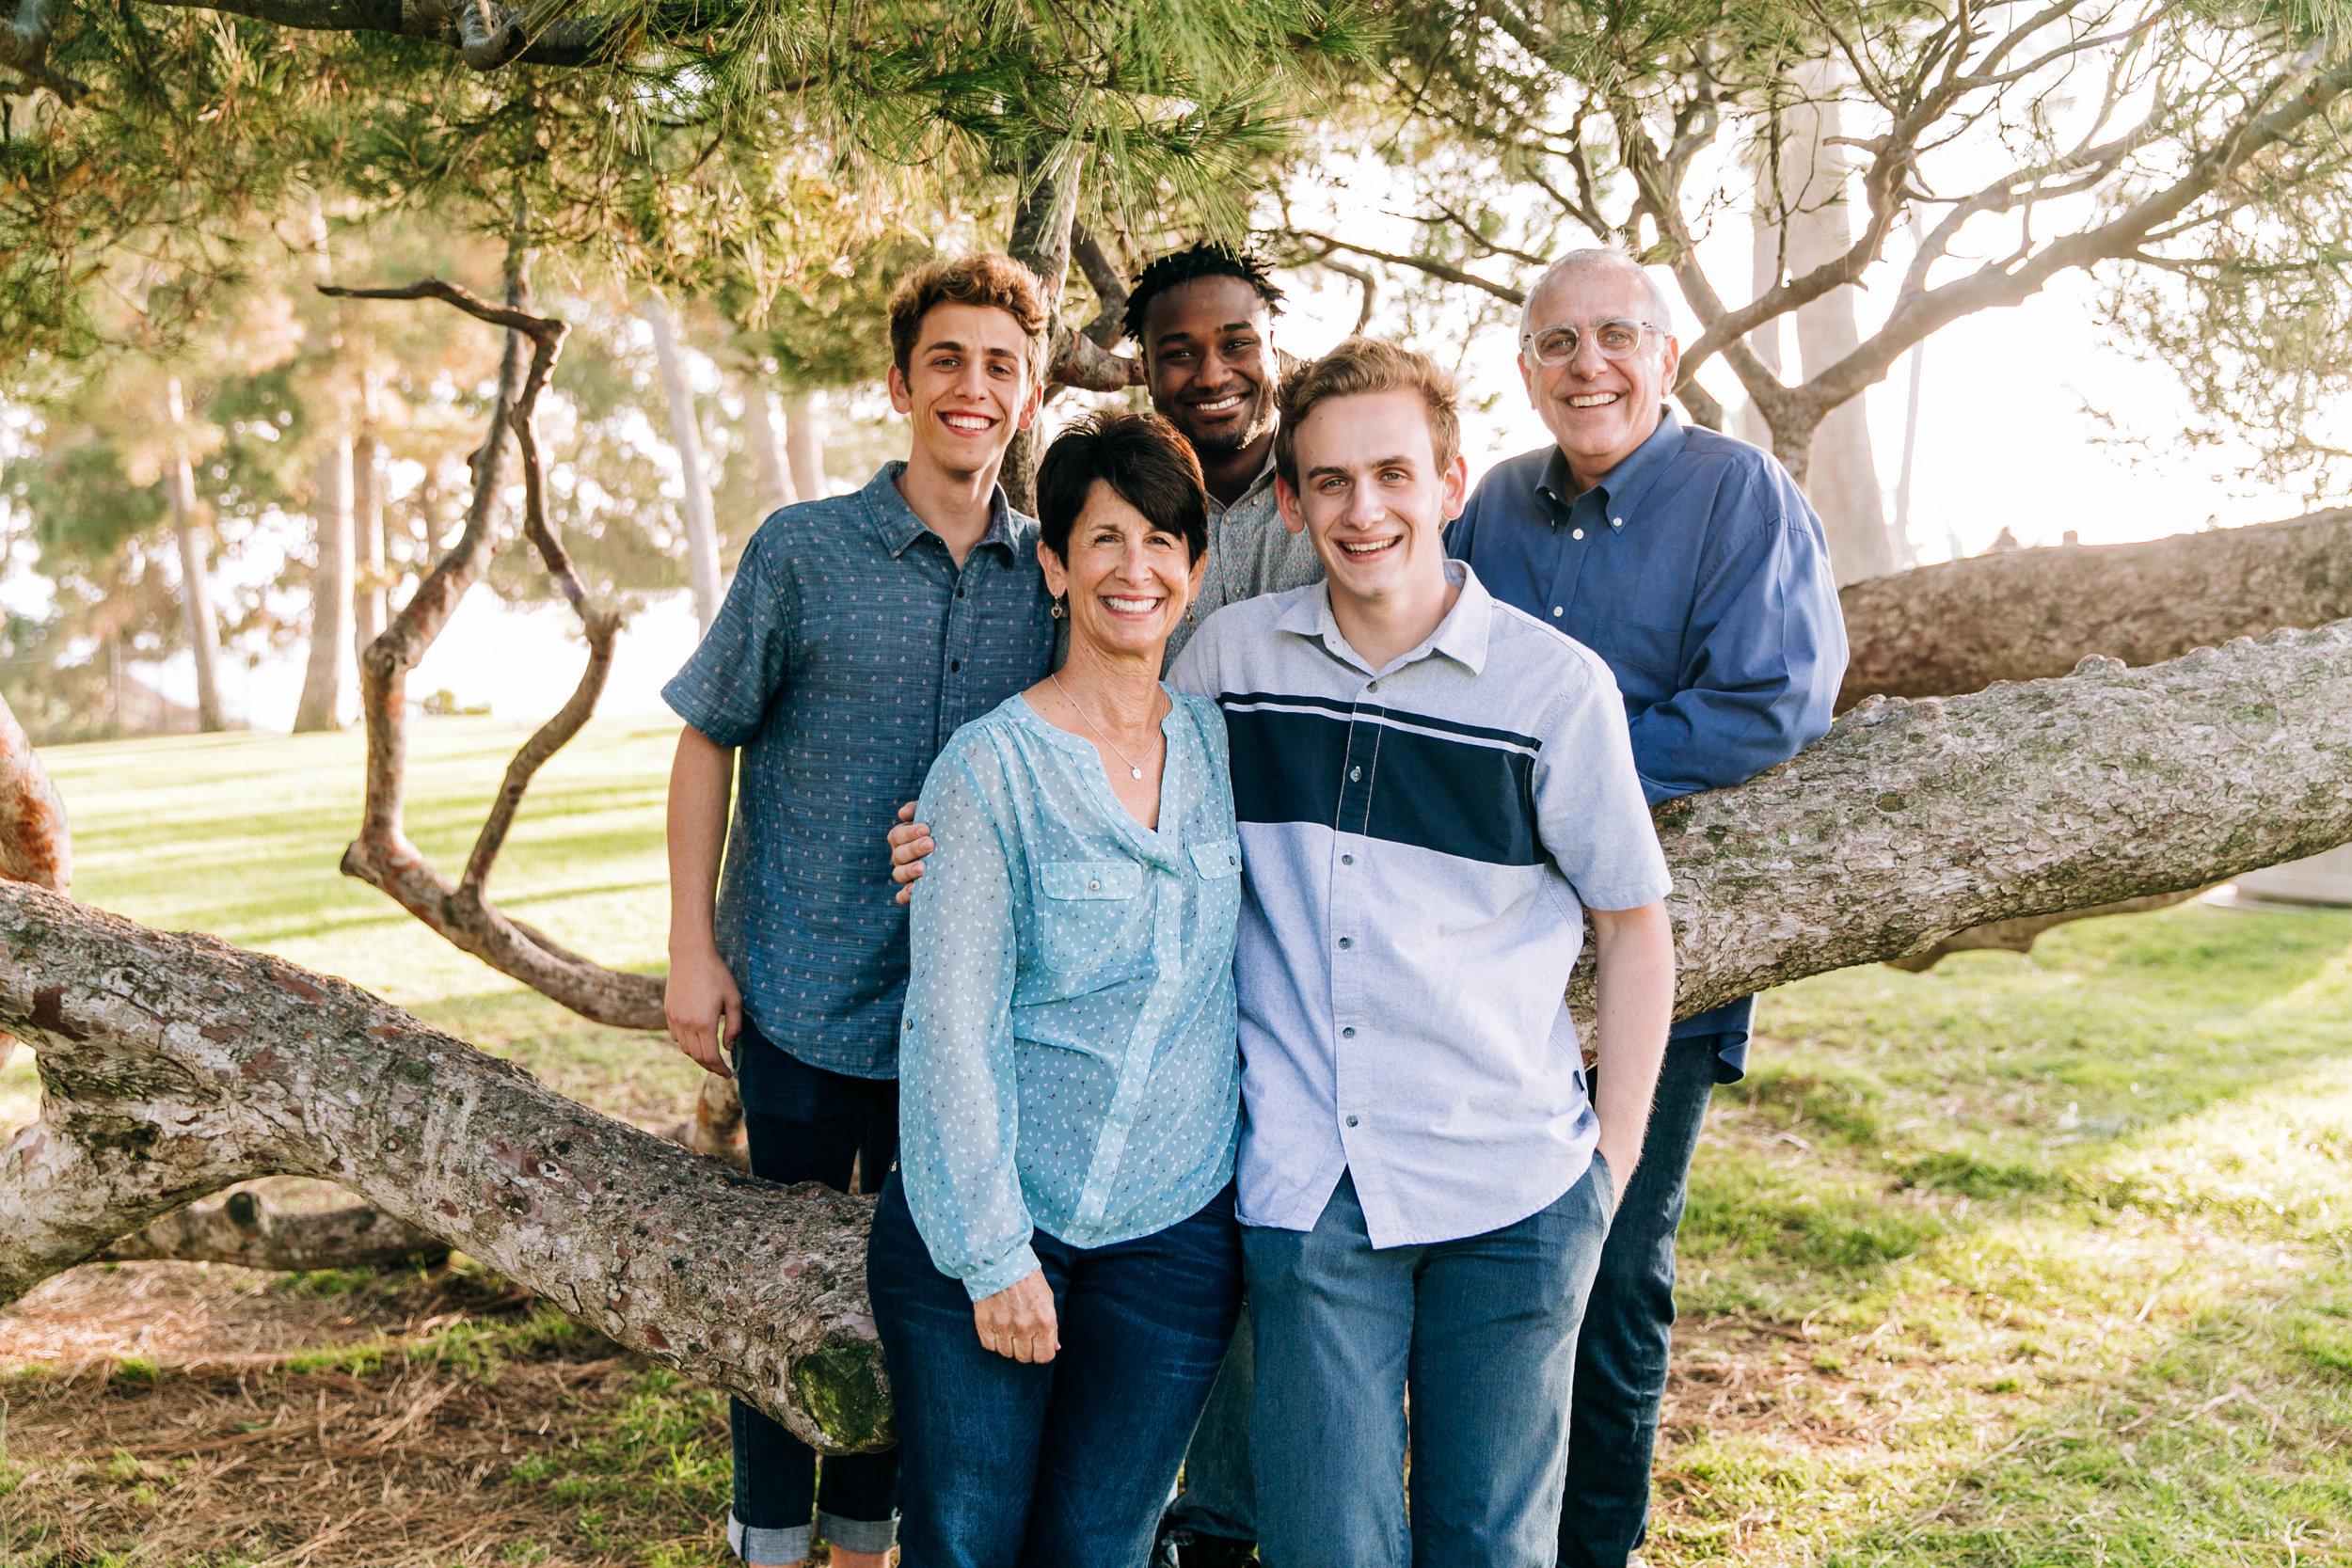 KaraNixonWeddings-FamilyPhotographer-AlisoViejo-6.jpg